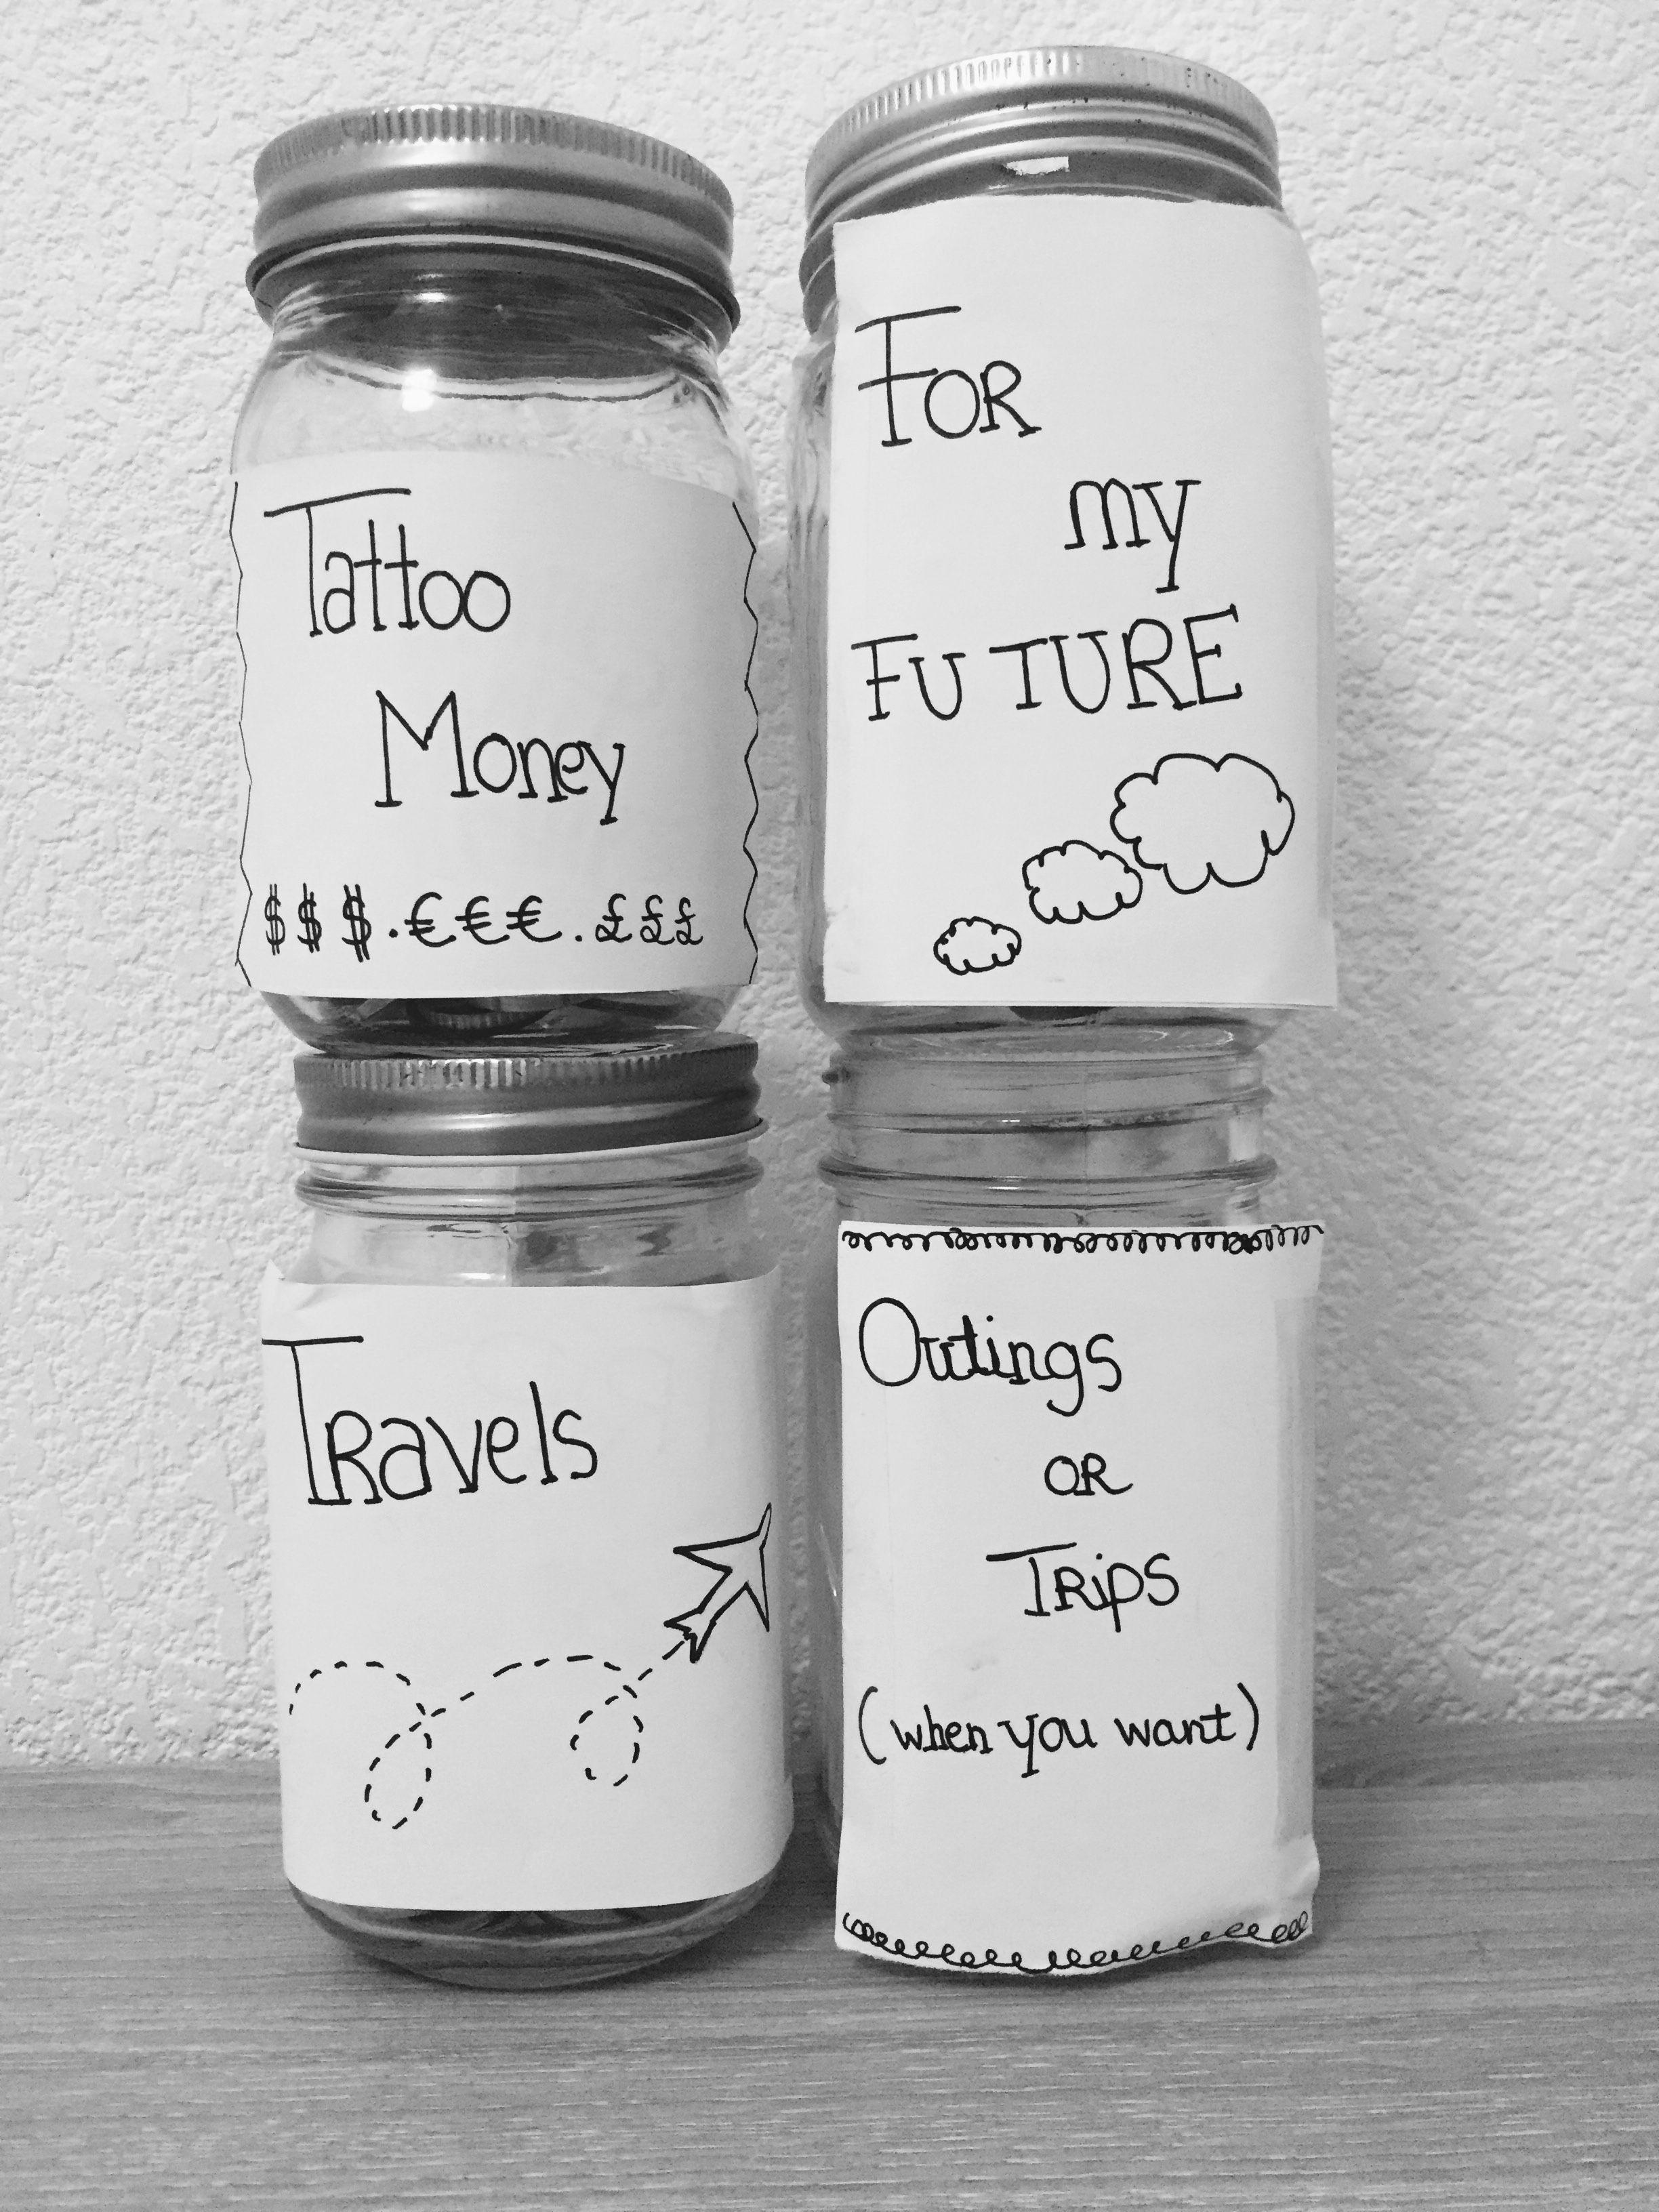 Pin By Makayla Mooneyhan On Room Ideas Money Jars Saving Money